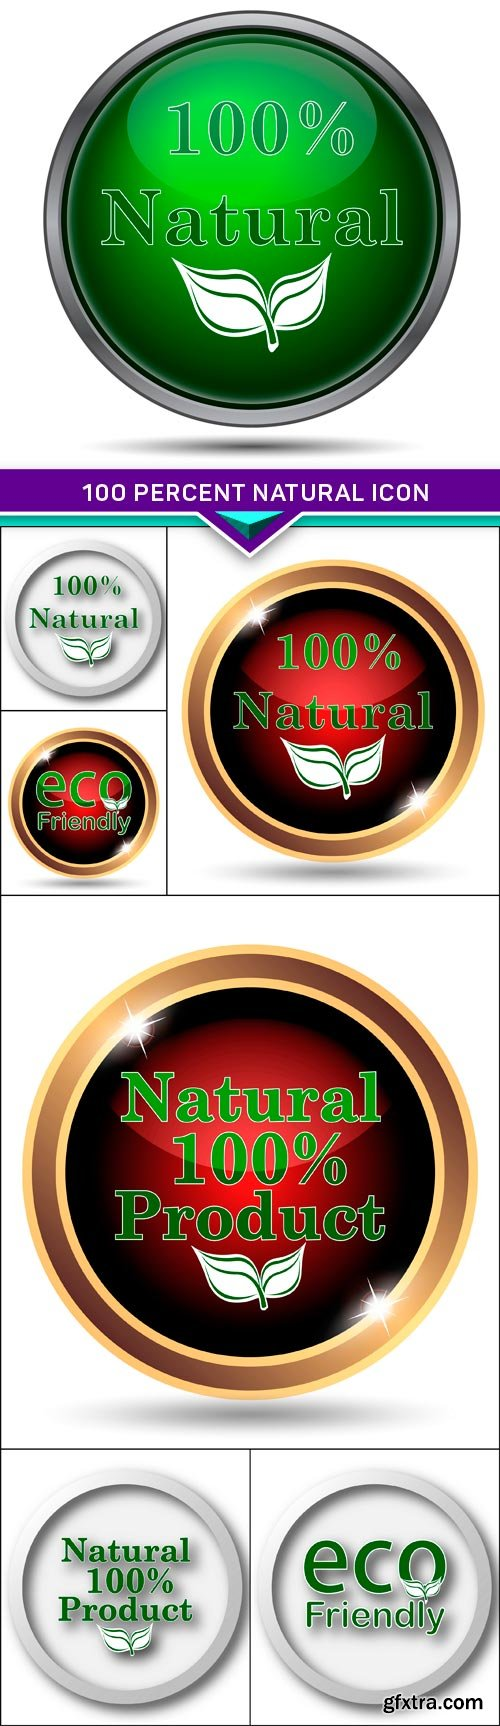 100 percent natural icon 7x JPEG